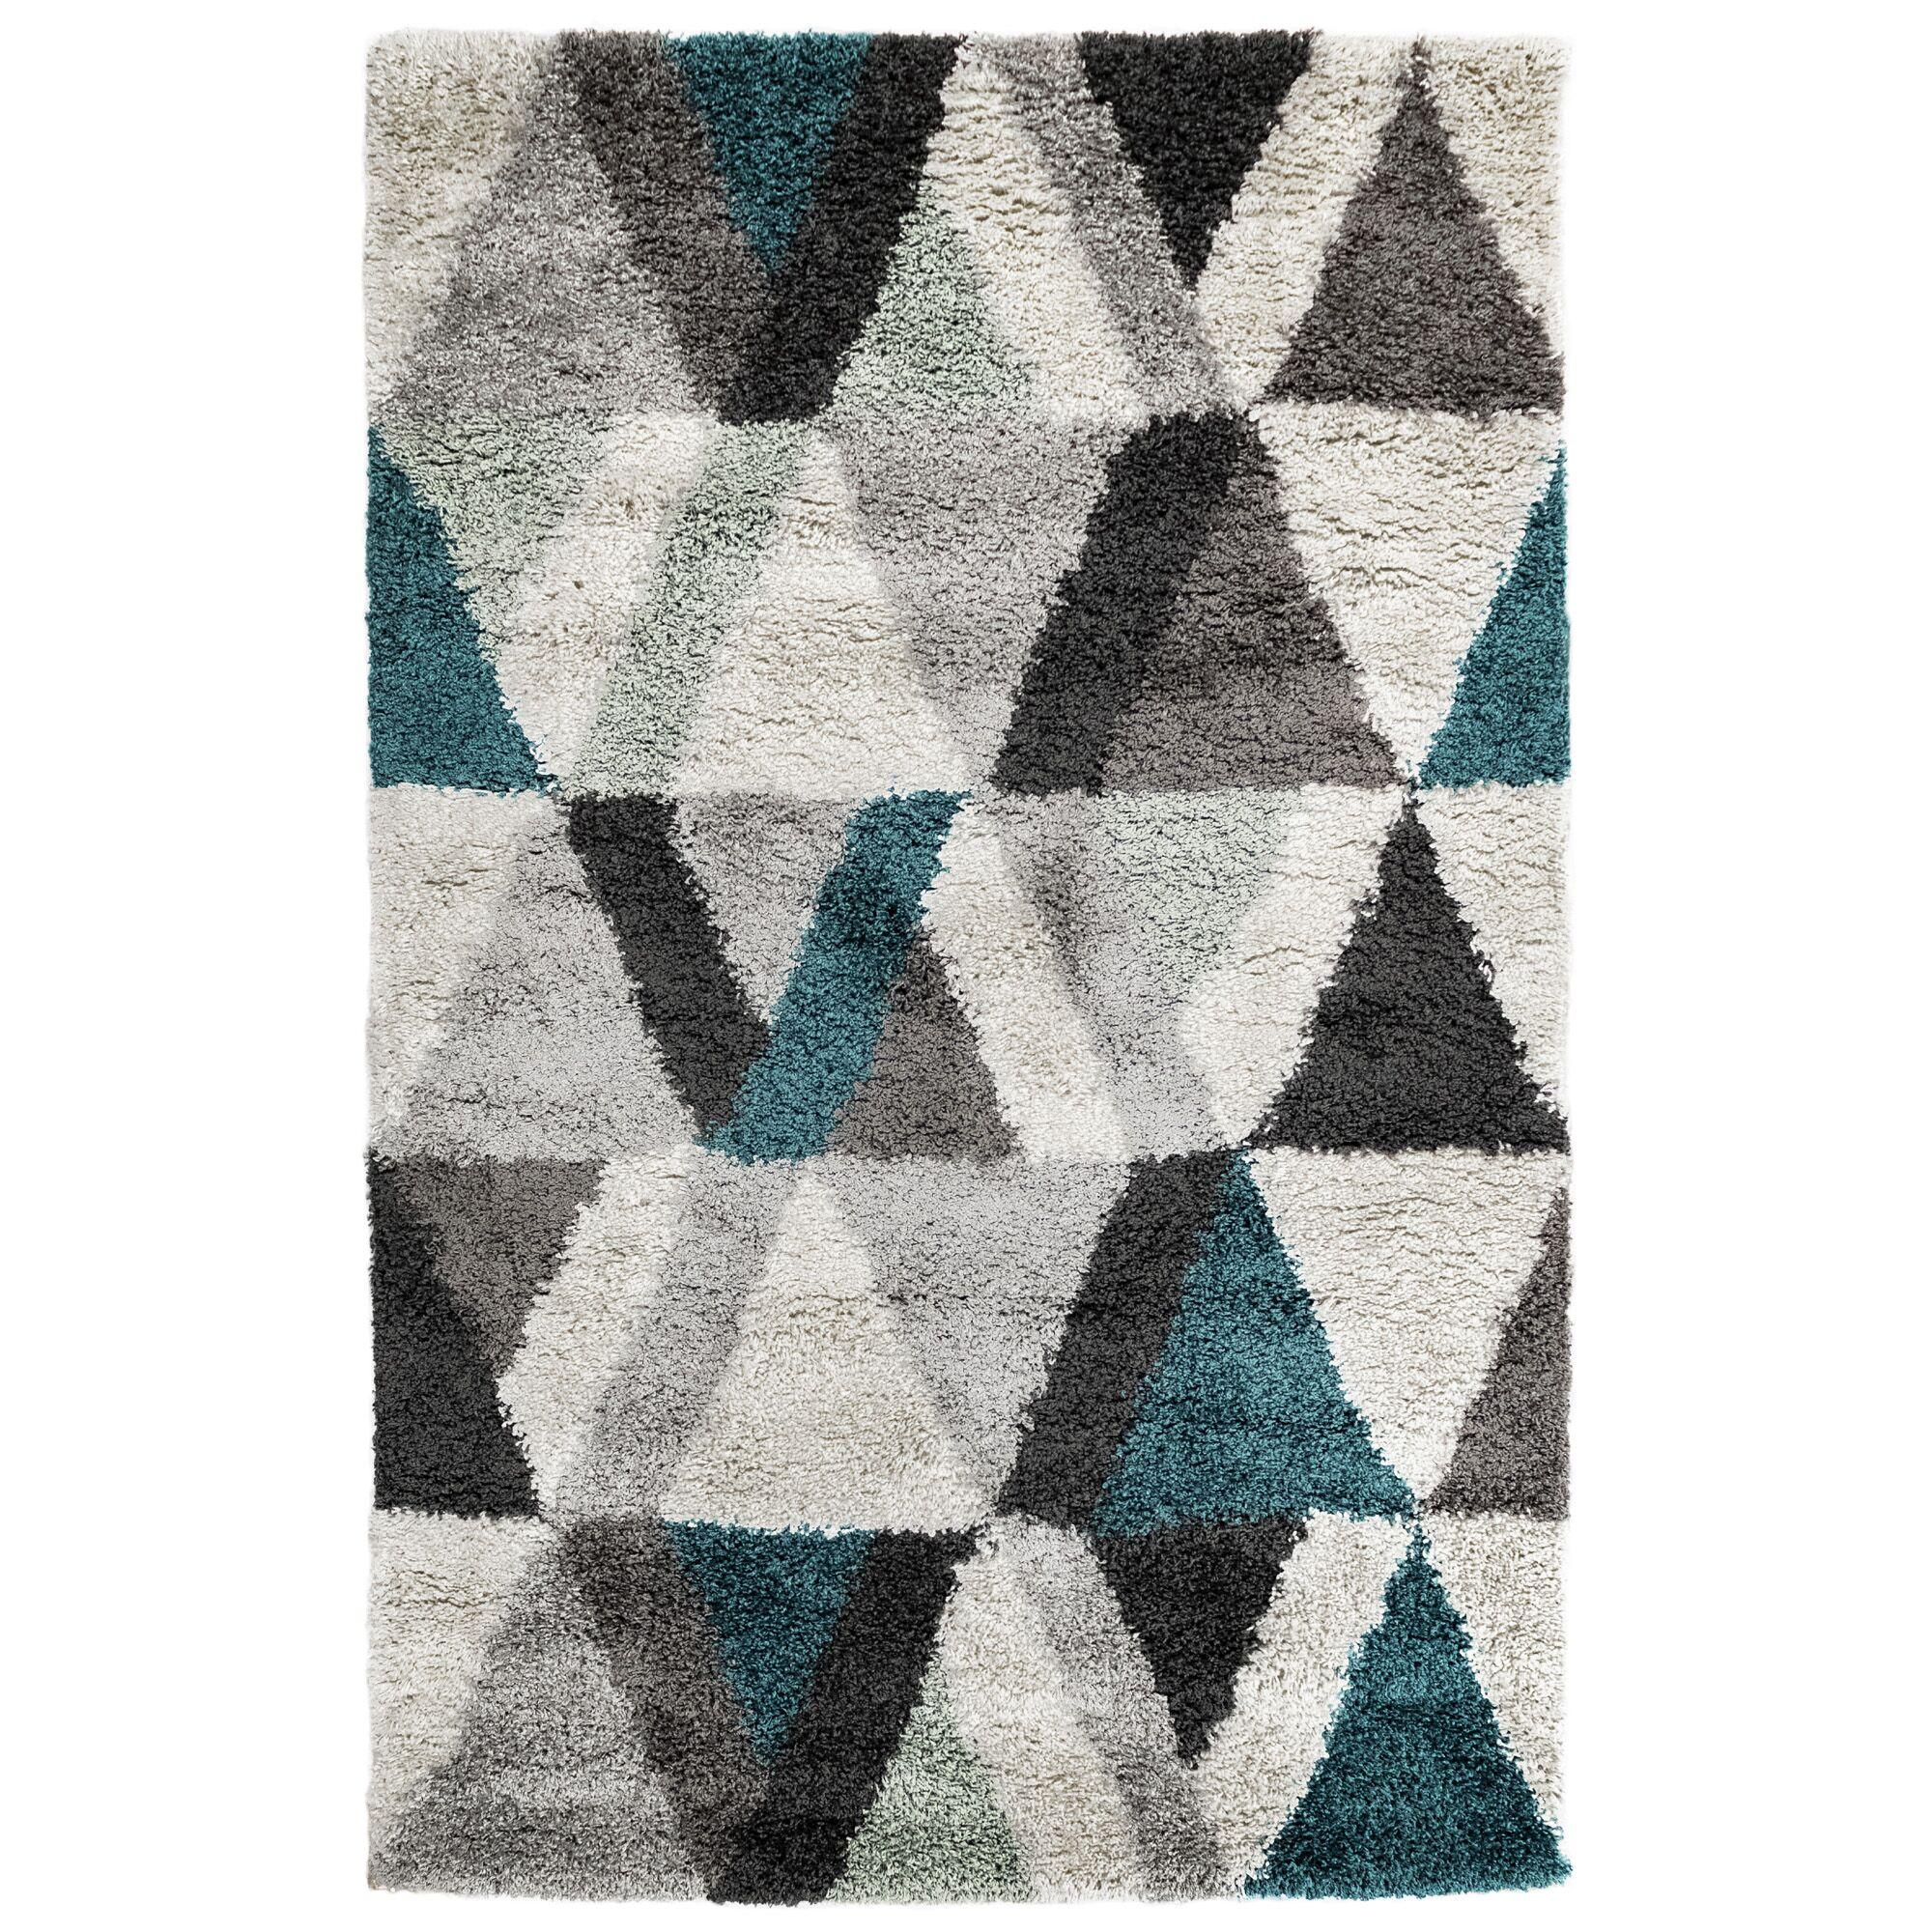 Bonham Triangle Gray Area Rug Size: Rectangle 7'10